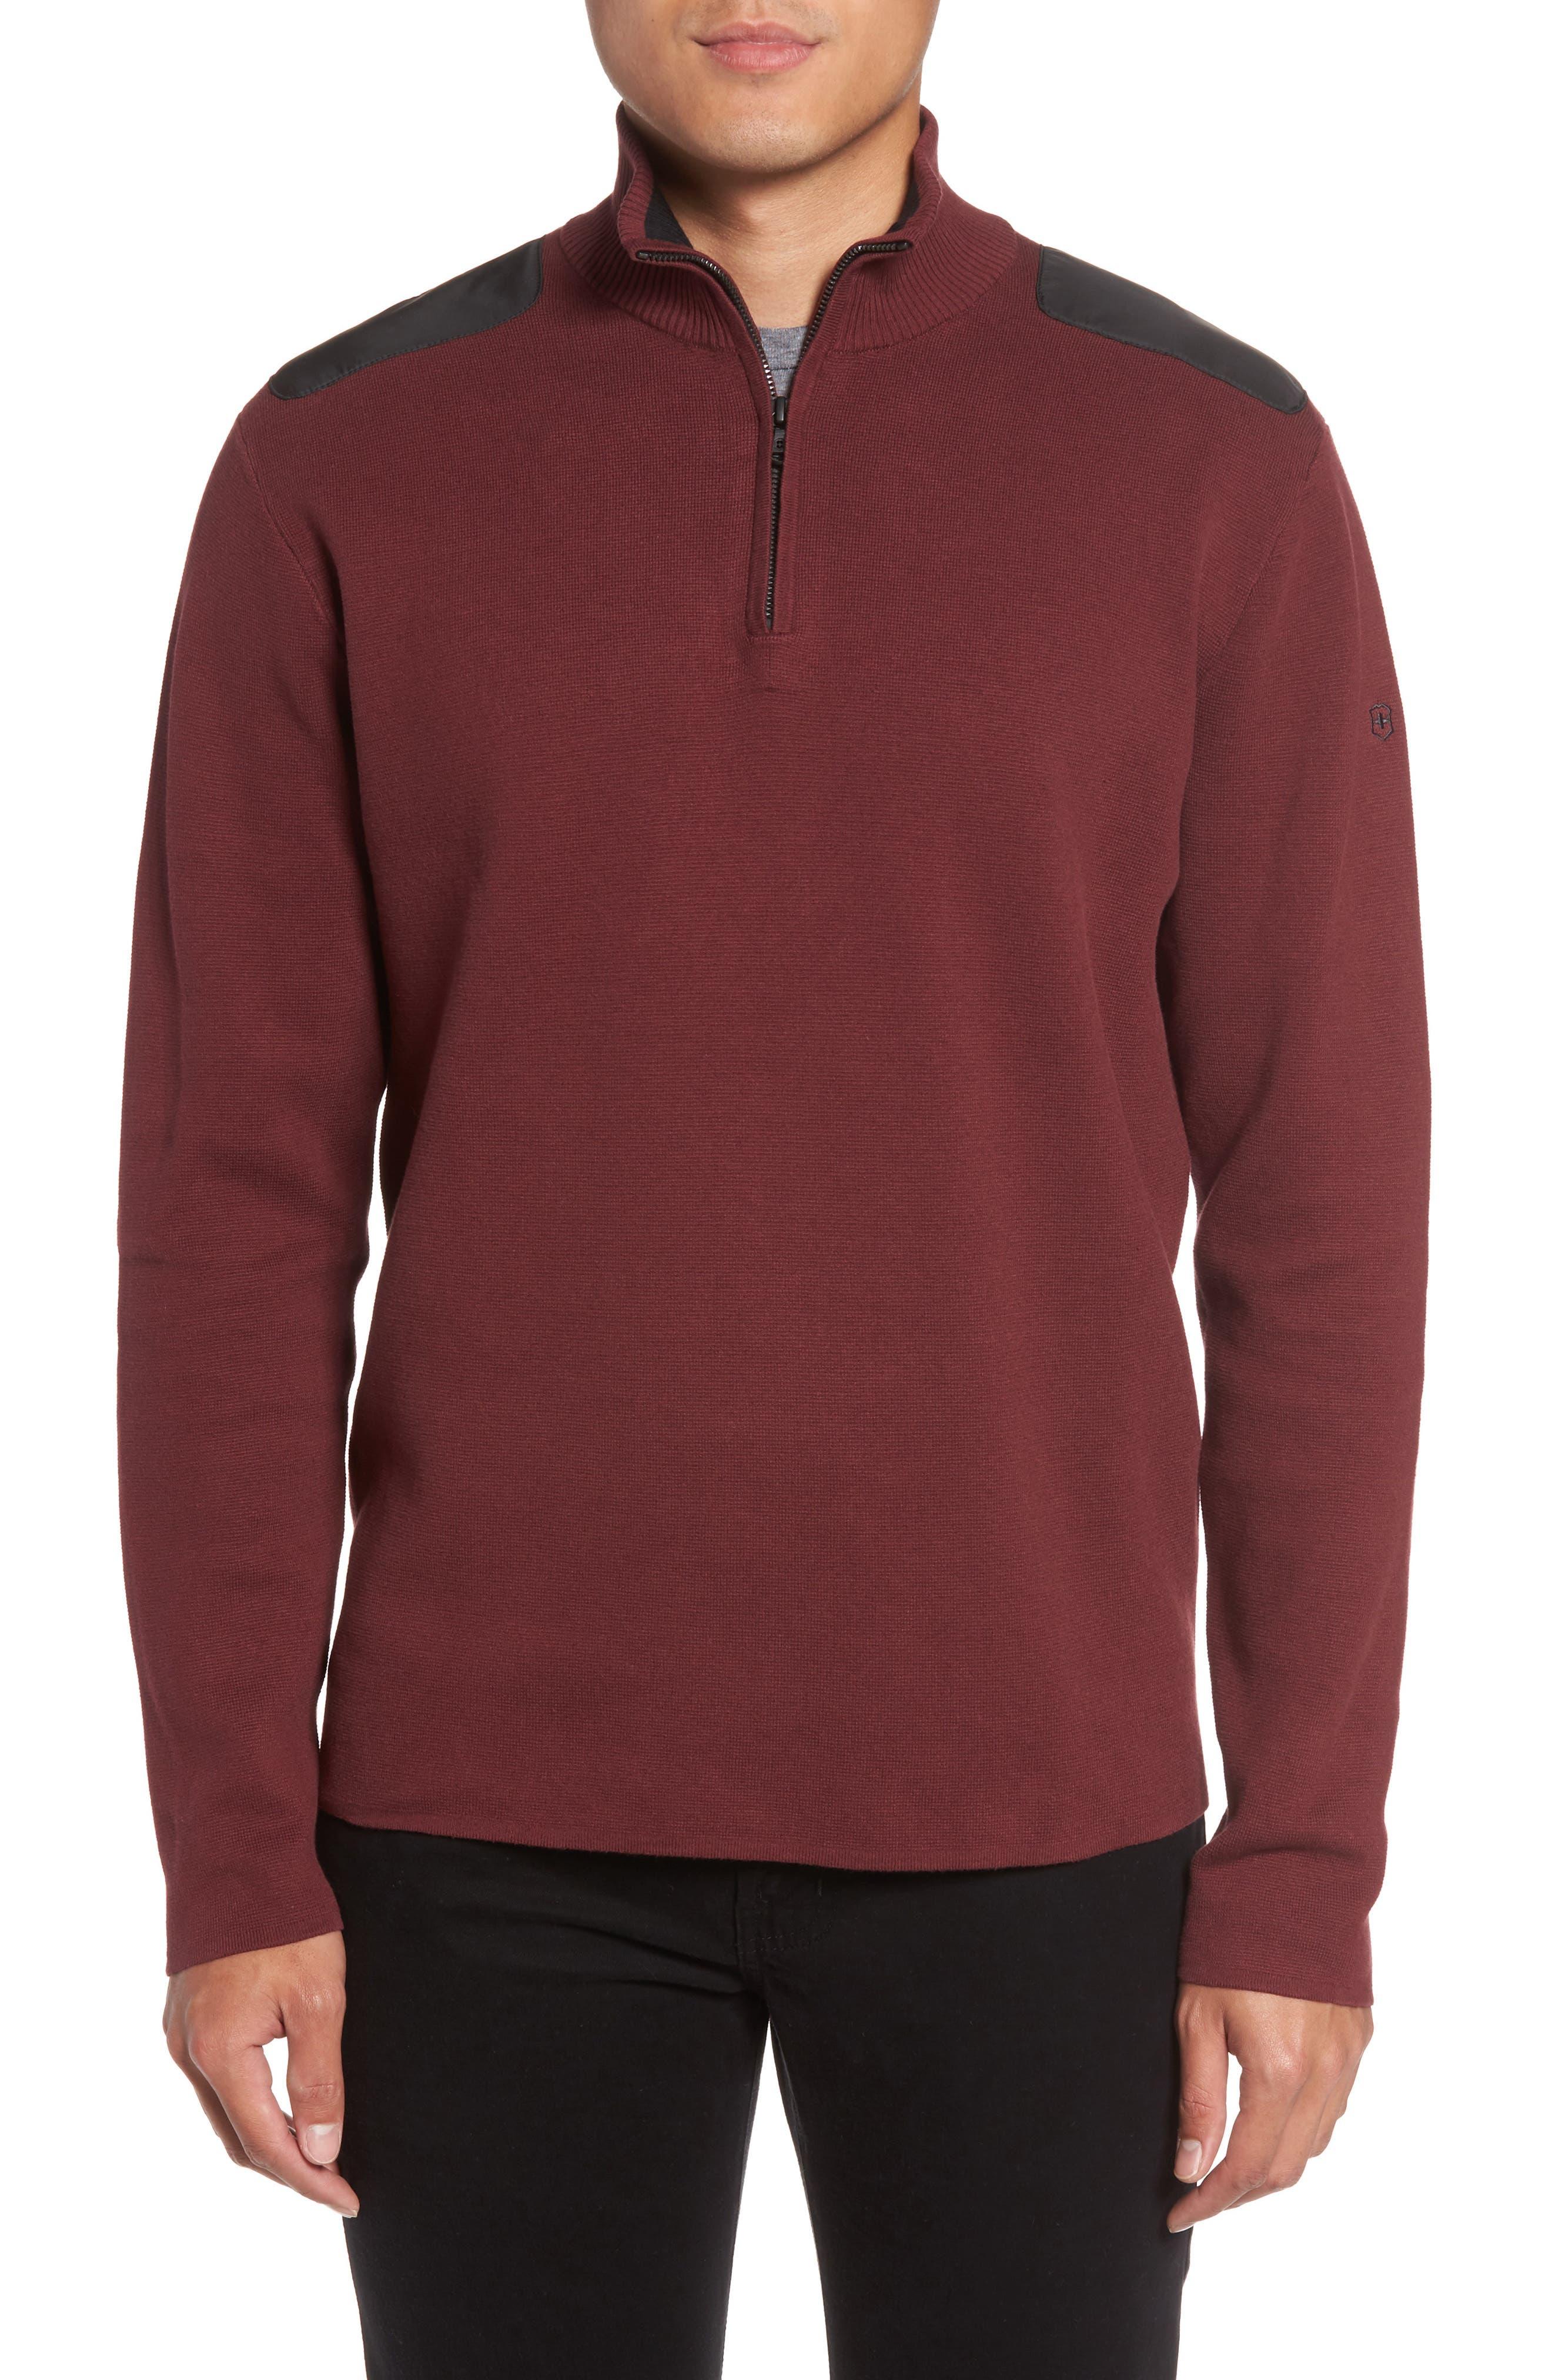 VictorinoxSwiss Army® 'Lieutenant' Half Zip Sweater